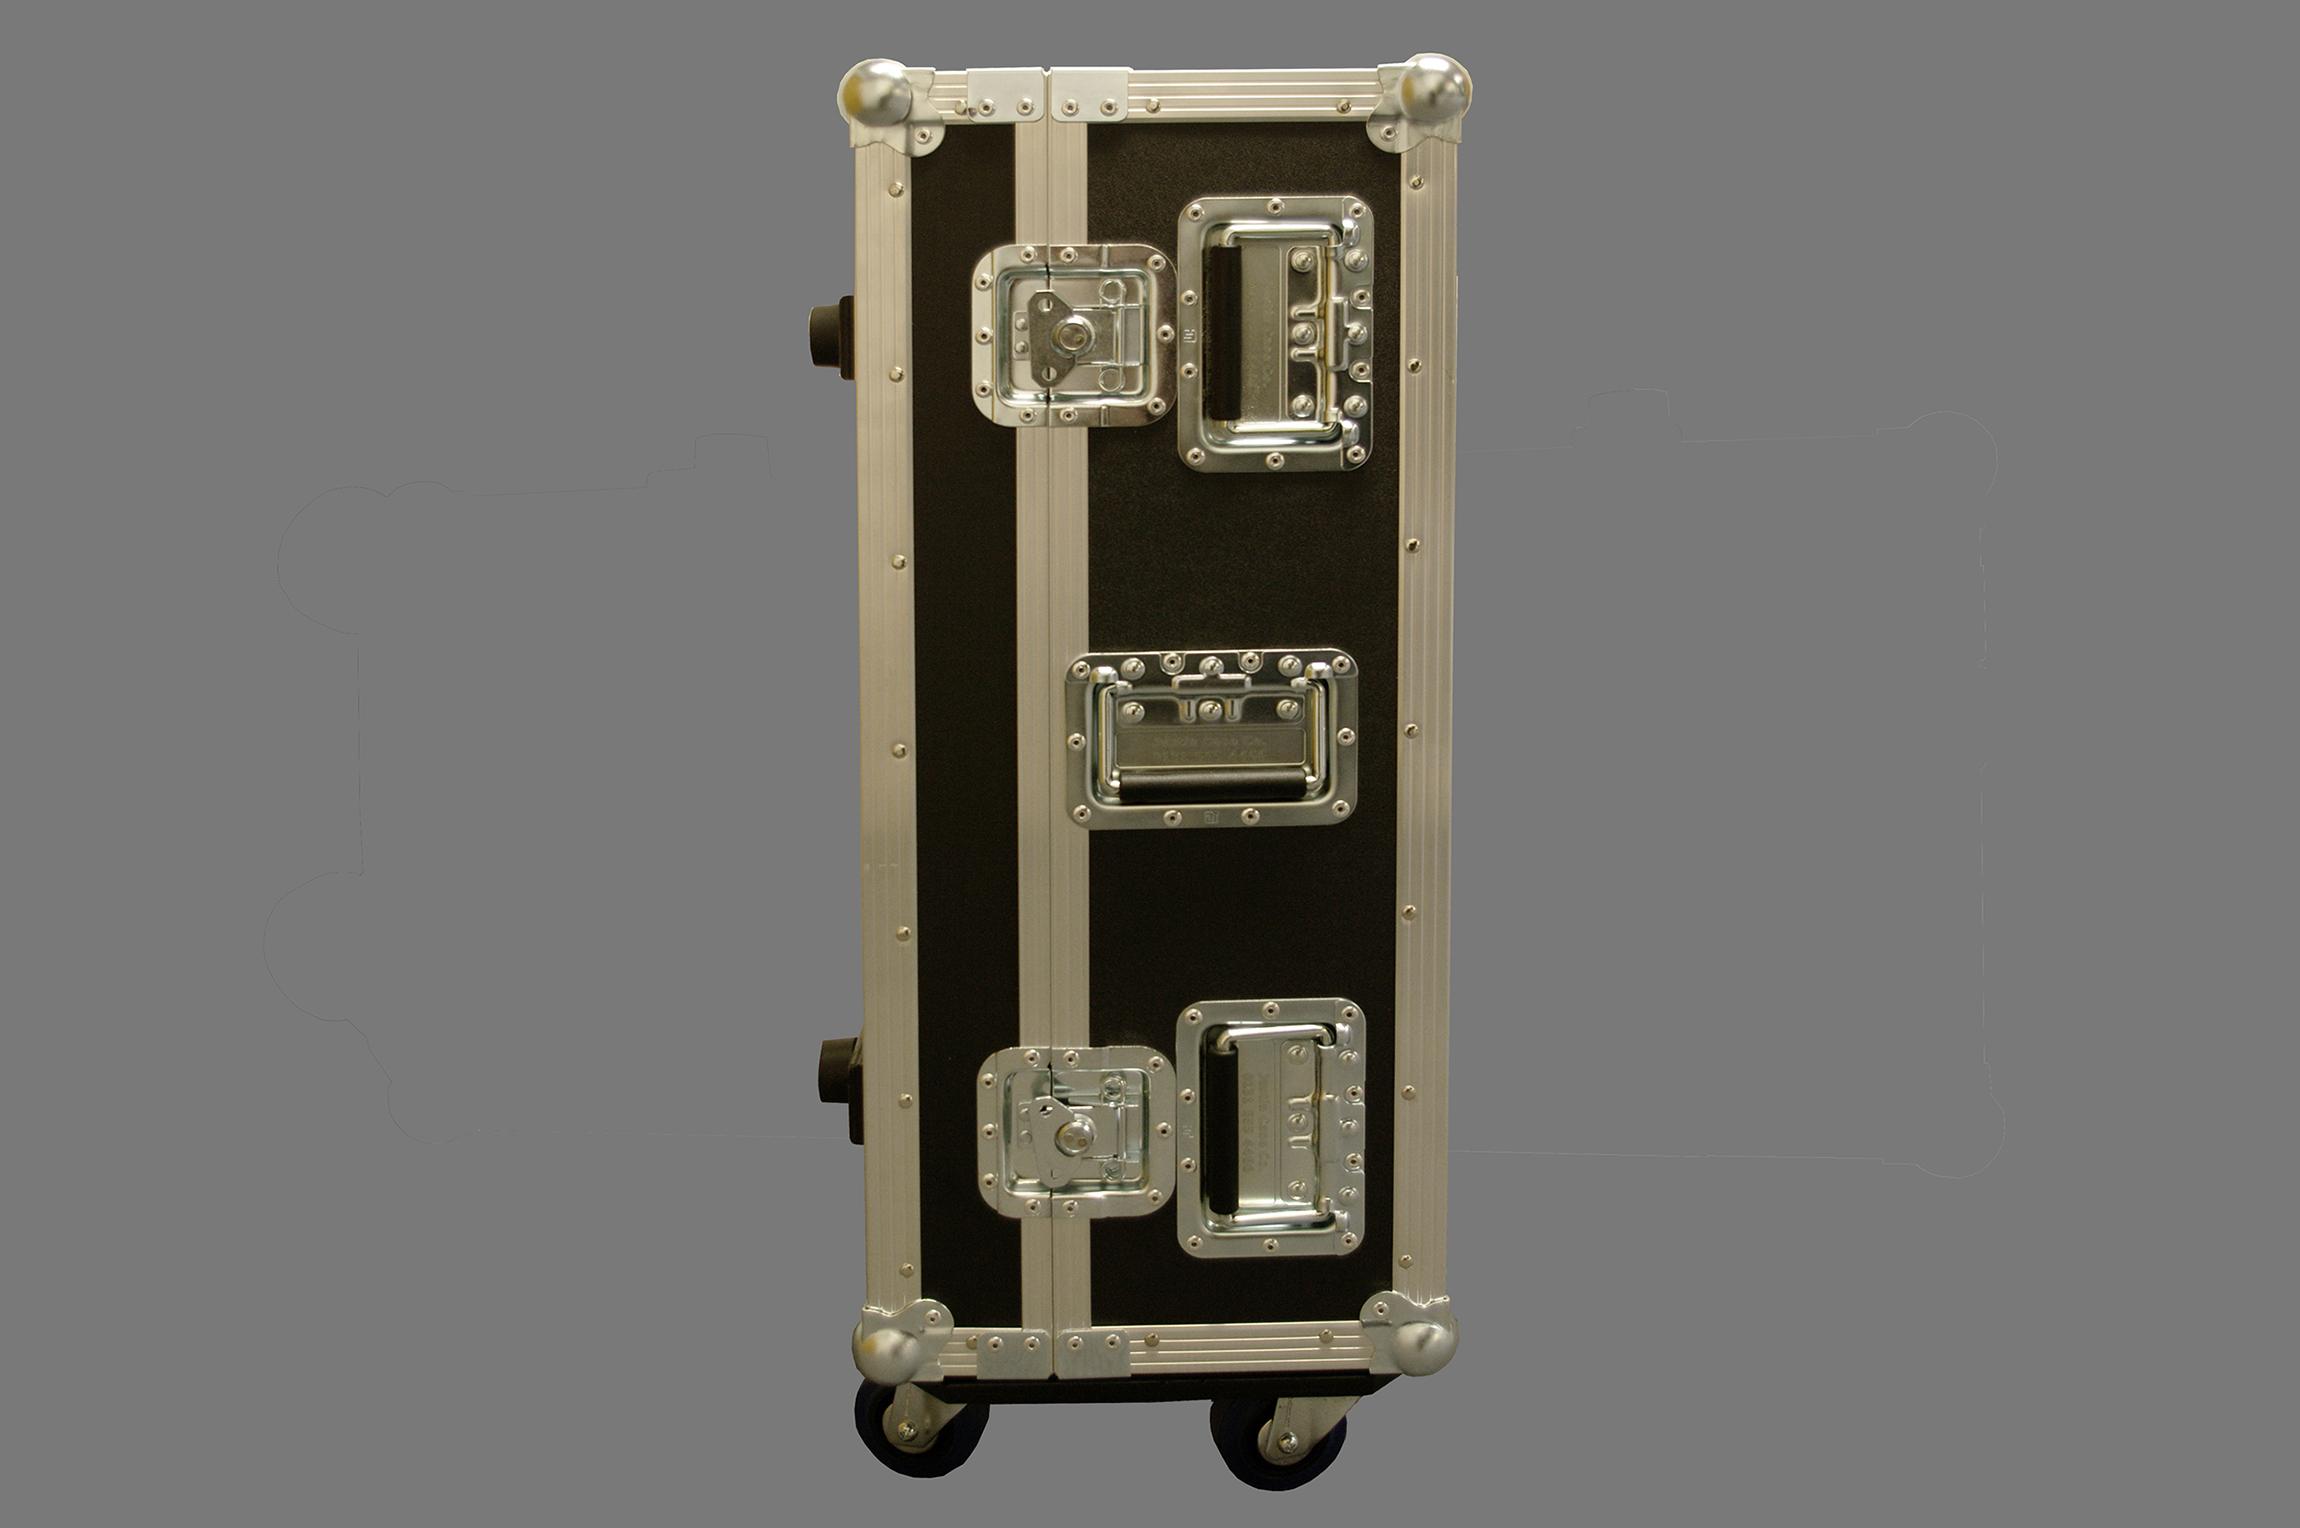 Panasonic projector case_02